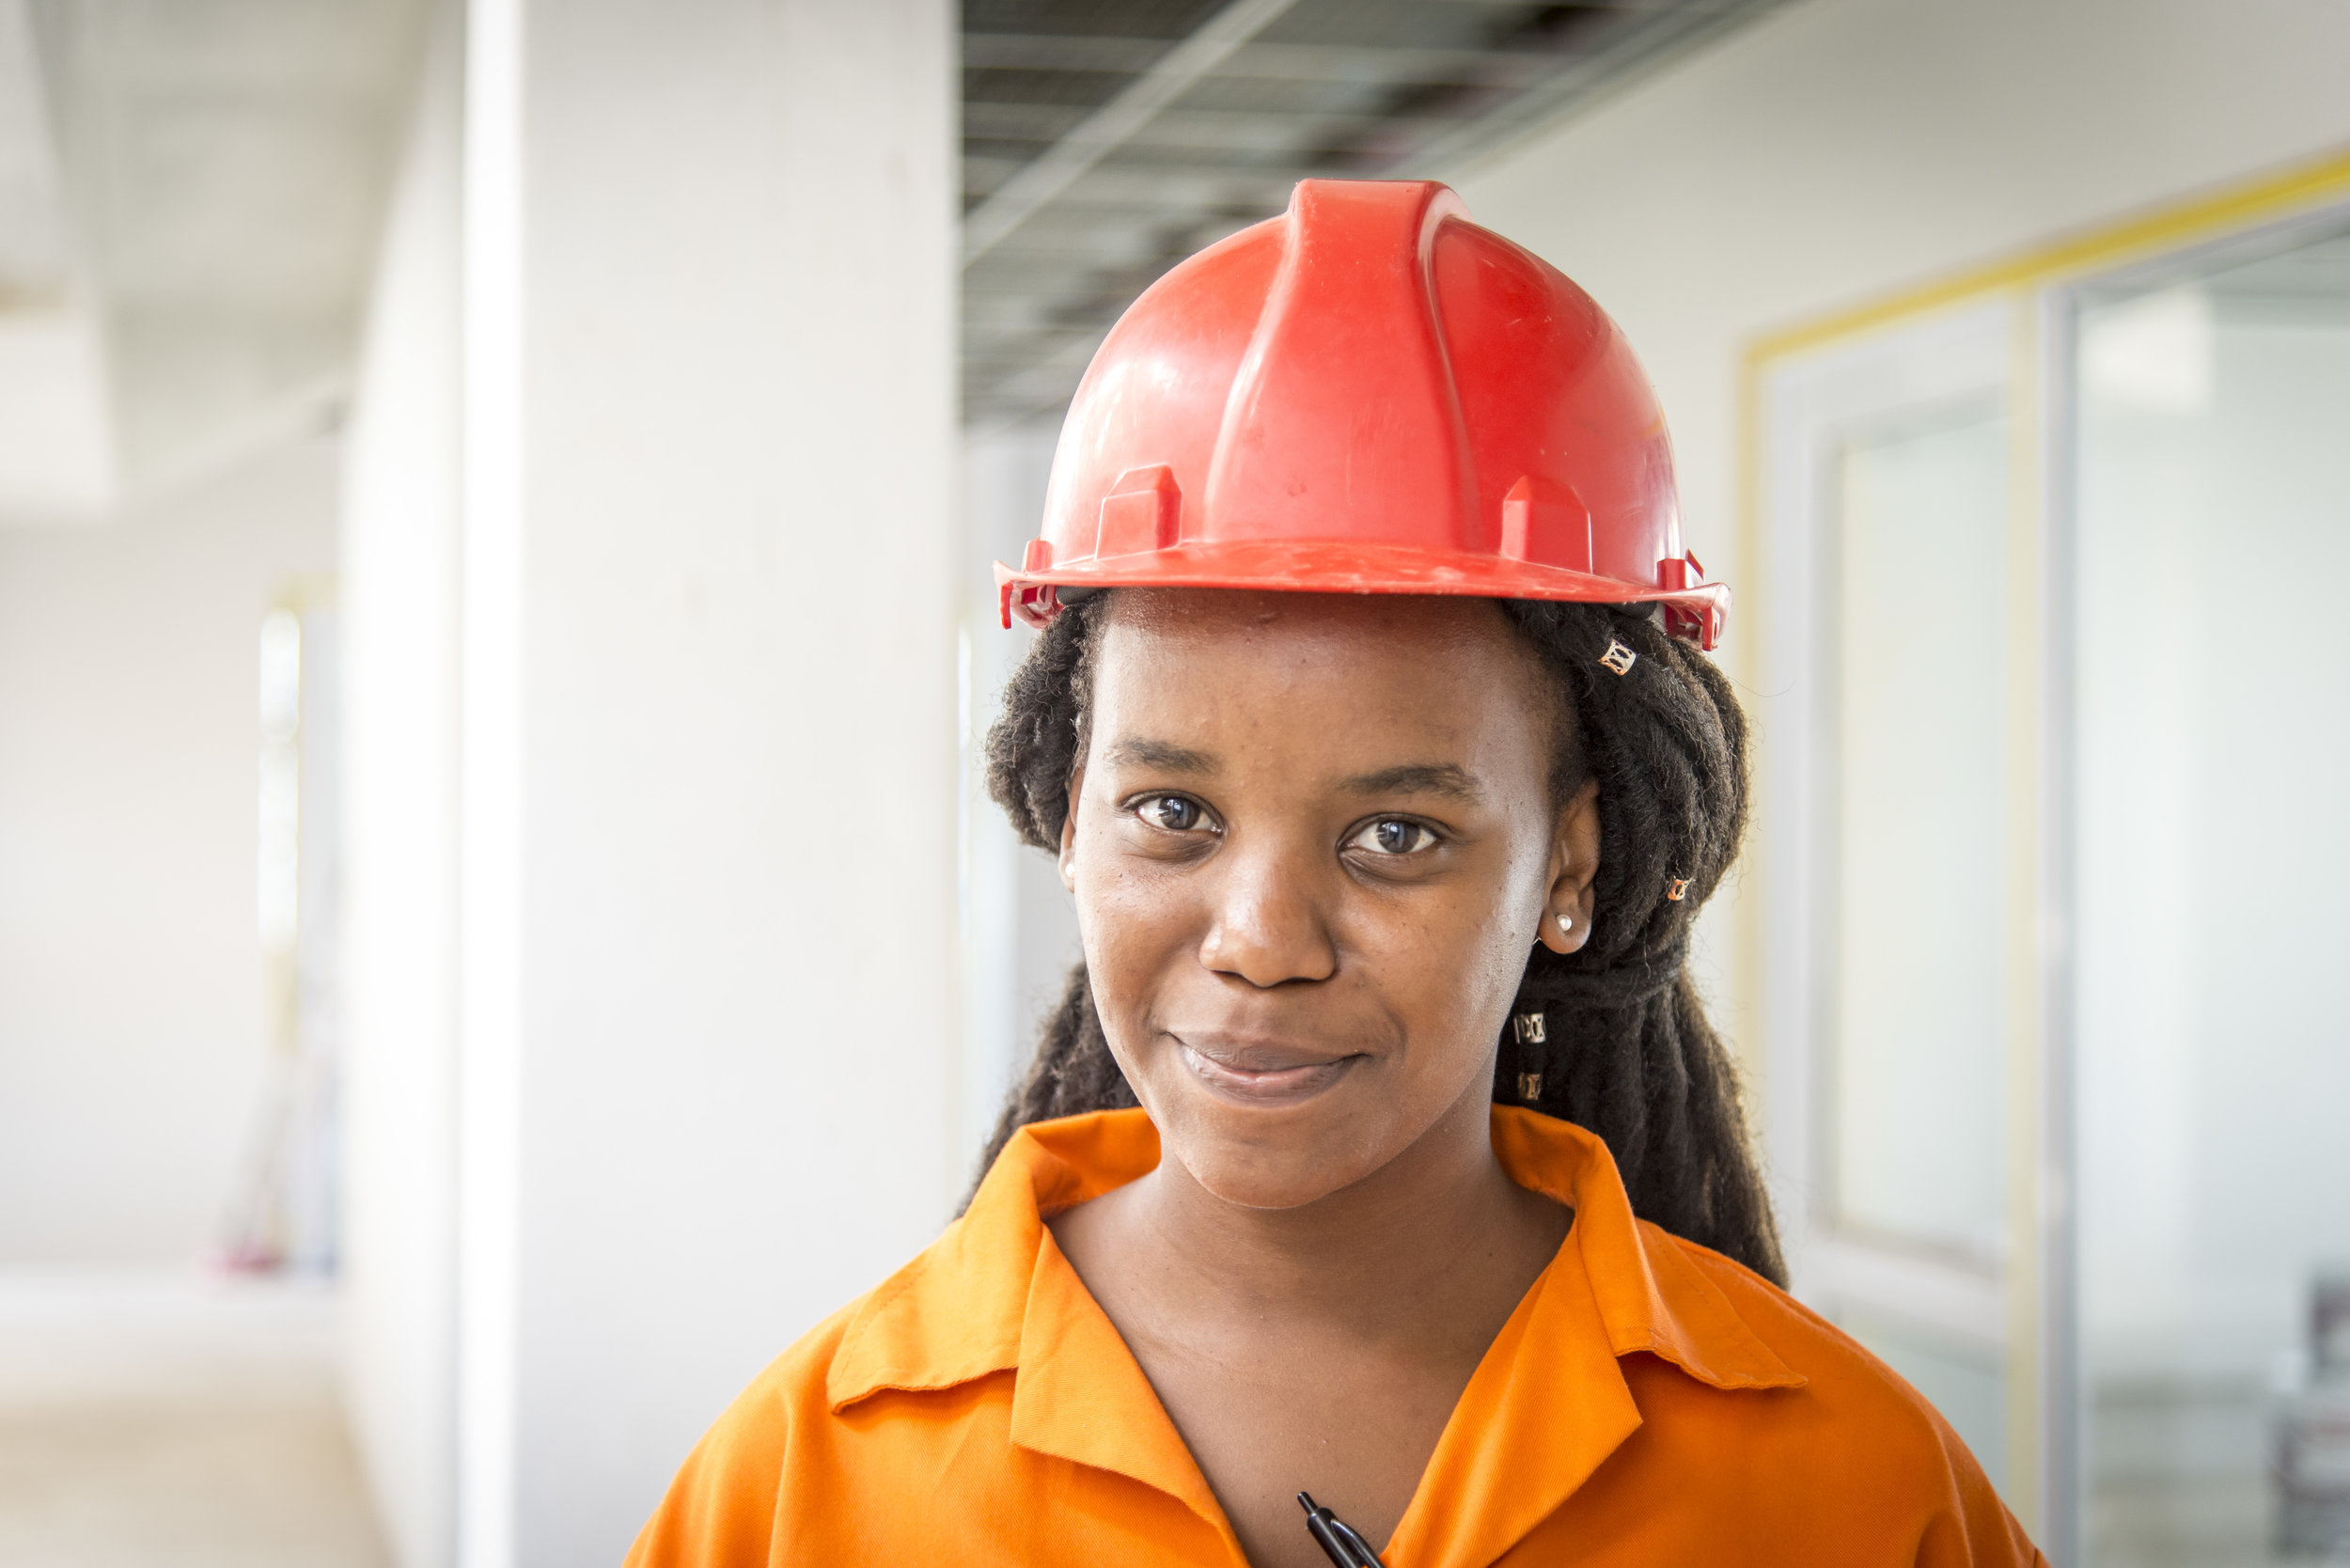 Ms Ncamisile Khumalo